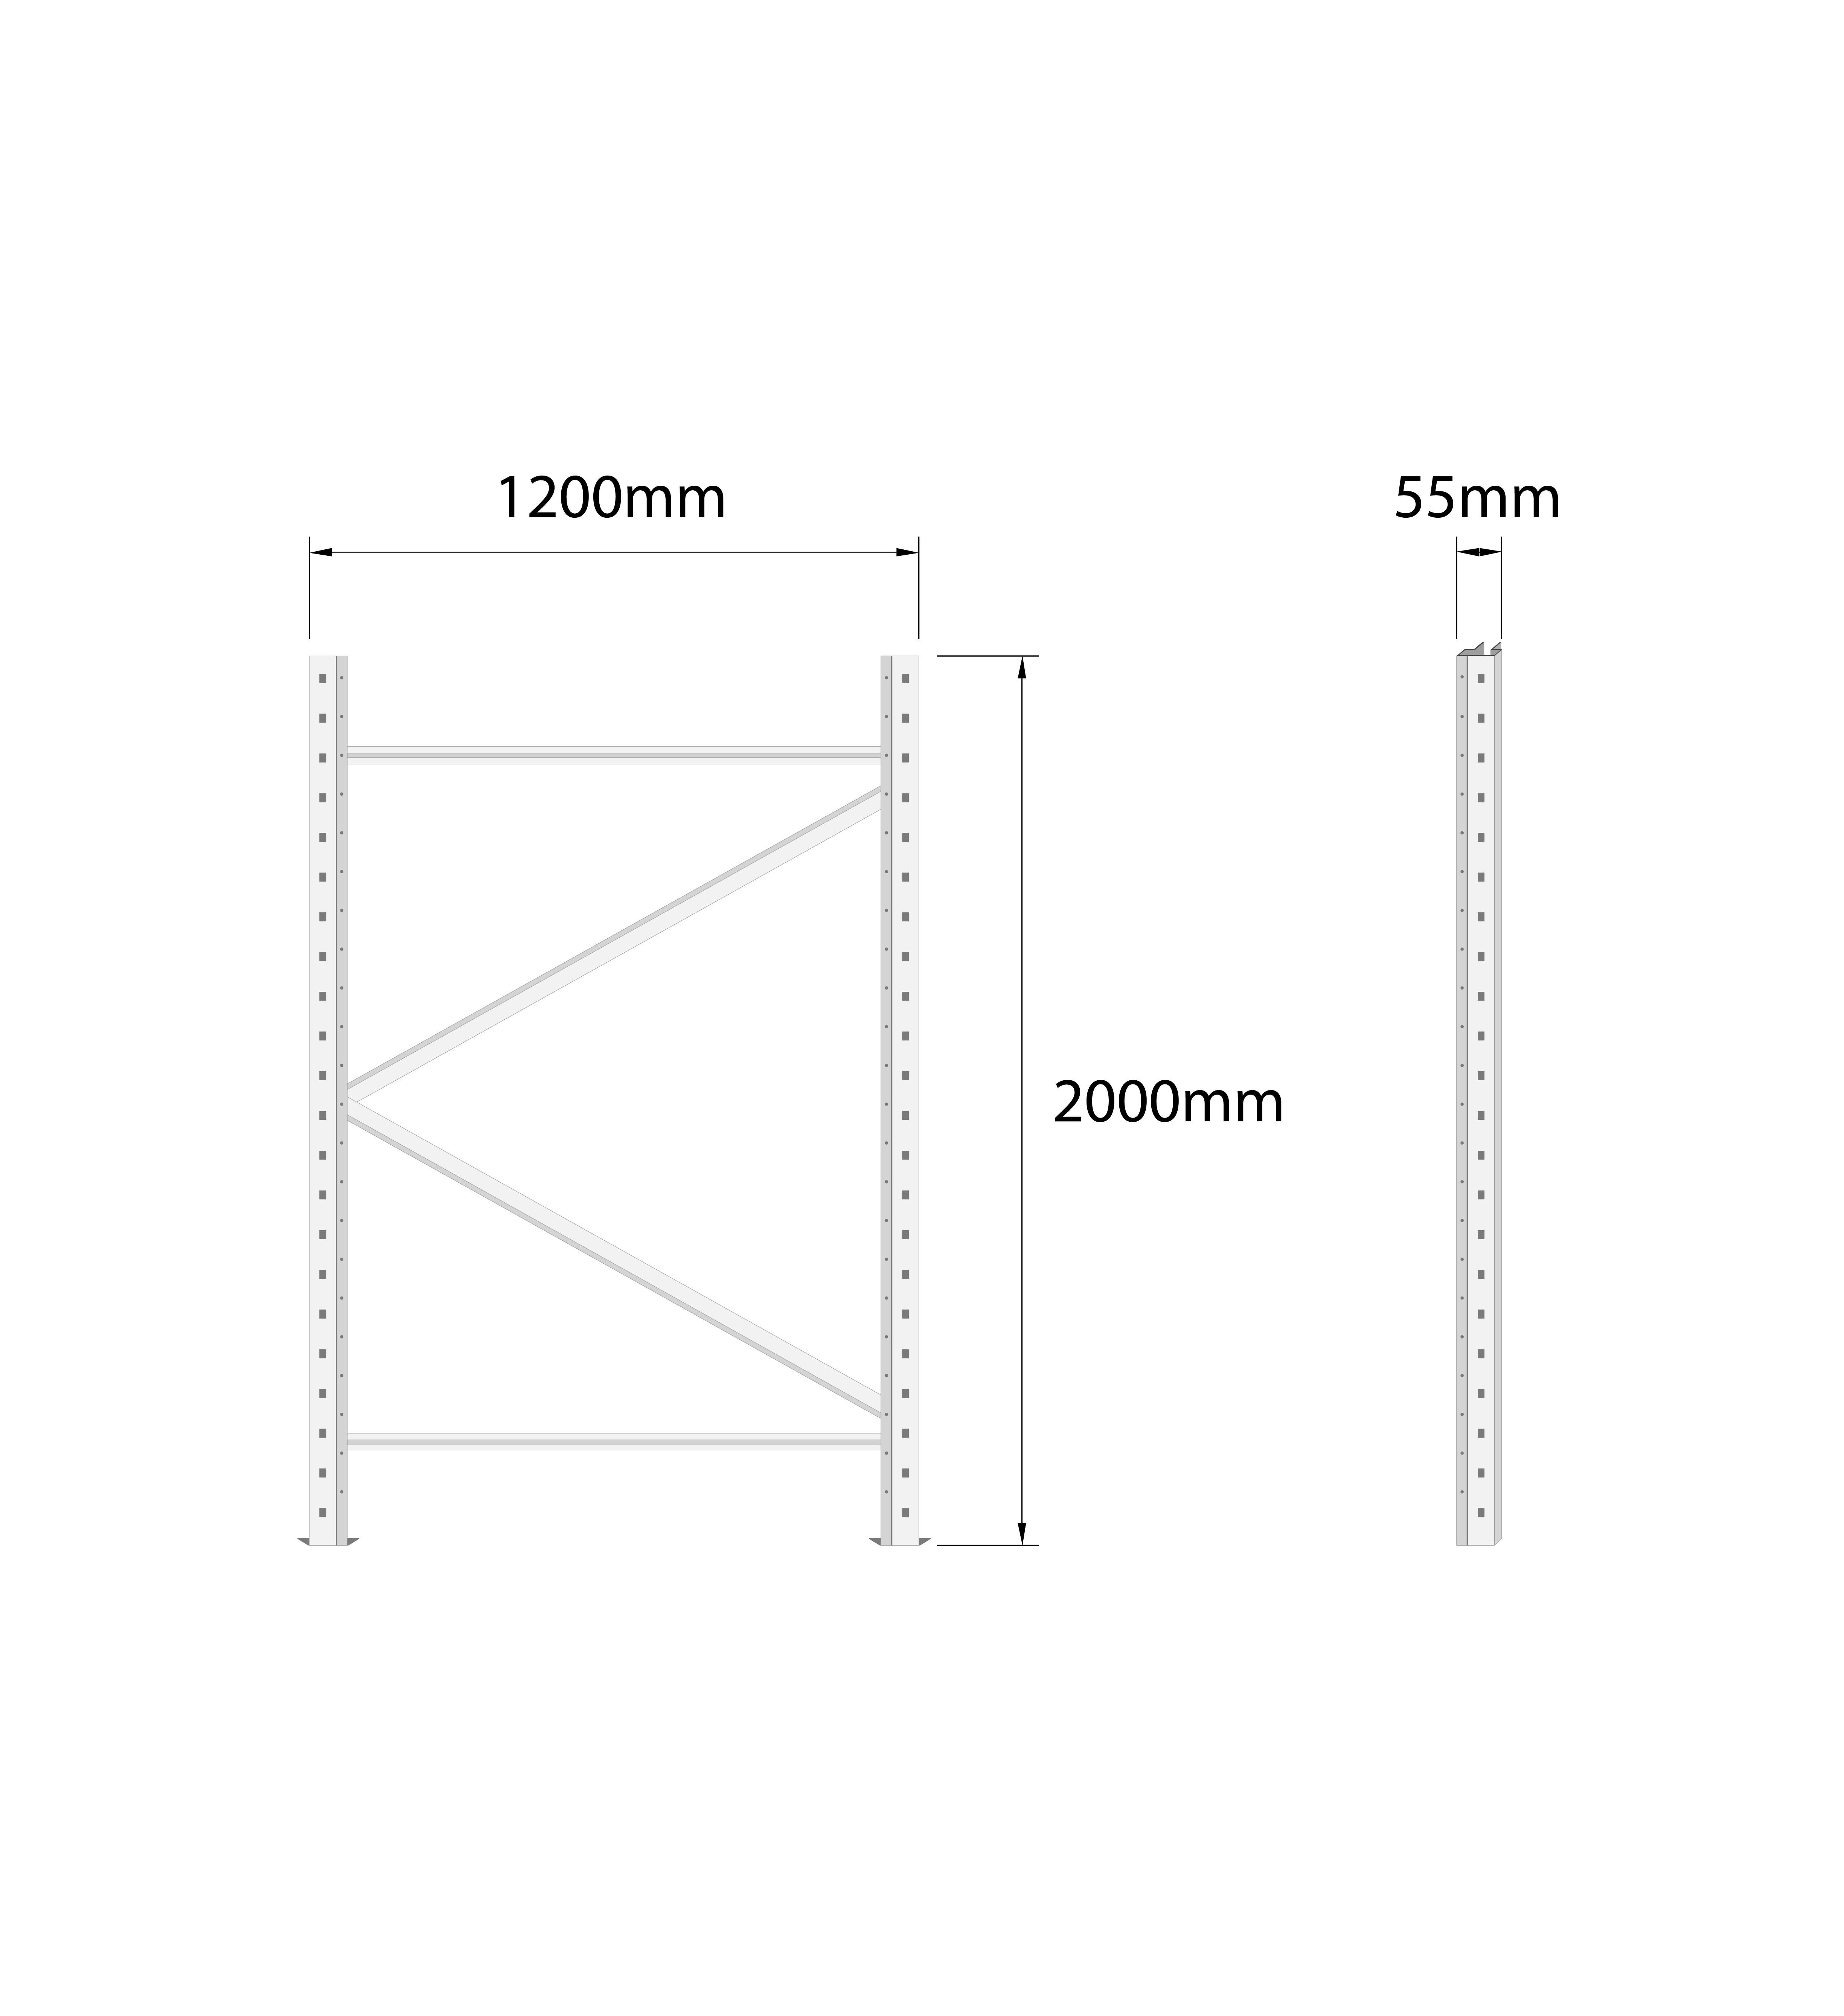 longspan - Uprights 2000mm_2000 x 1200 white.jpg